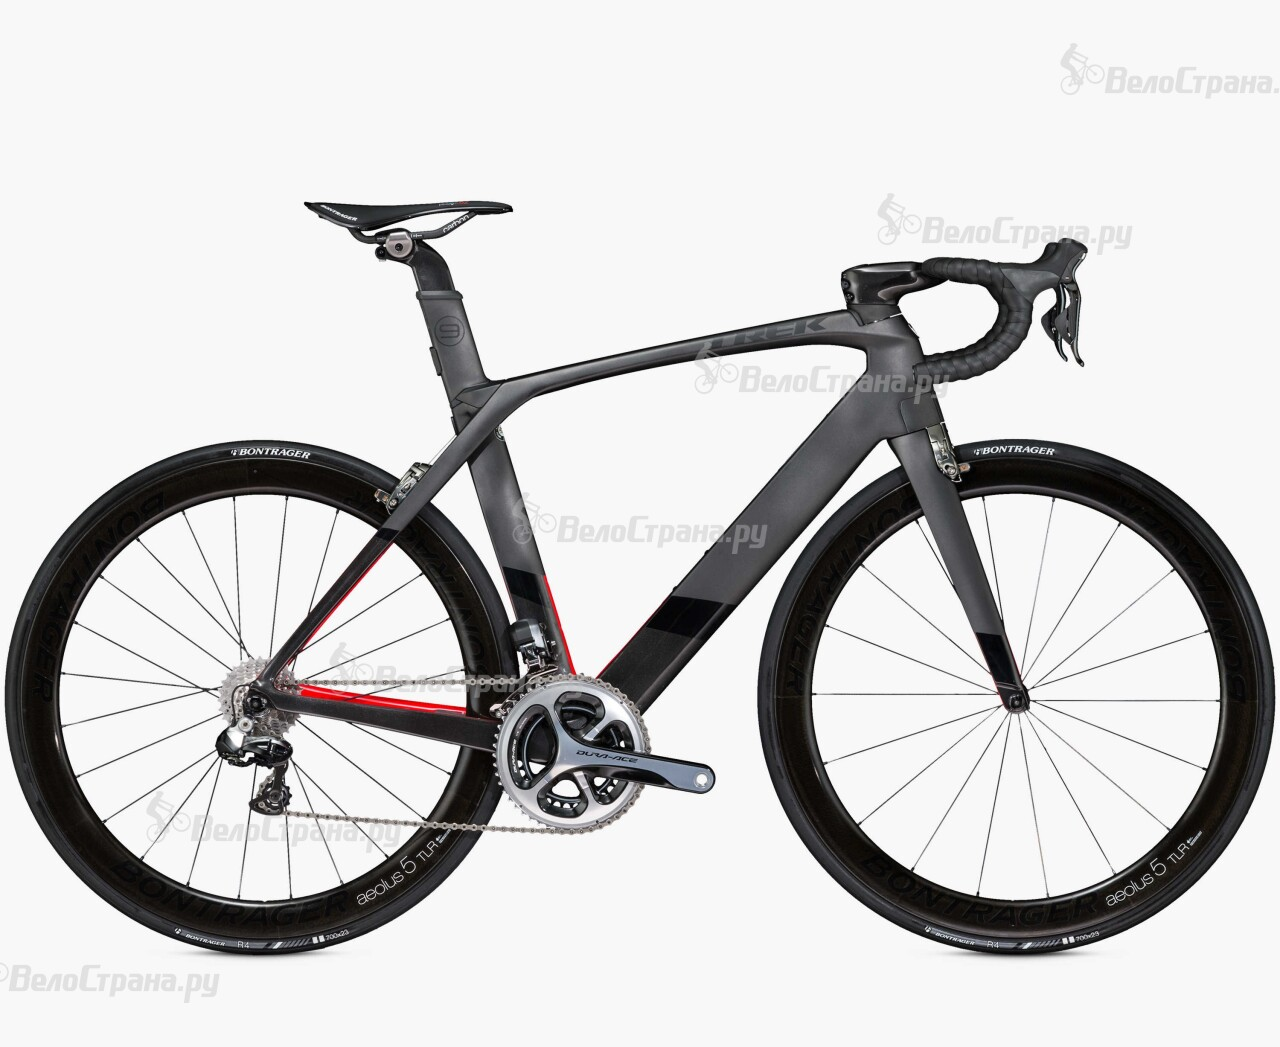 Велосипед Trek Madone 9.9 (2016) велосипед trek madone 7 9 2015